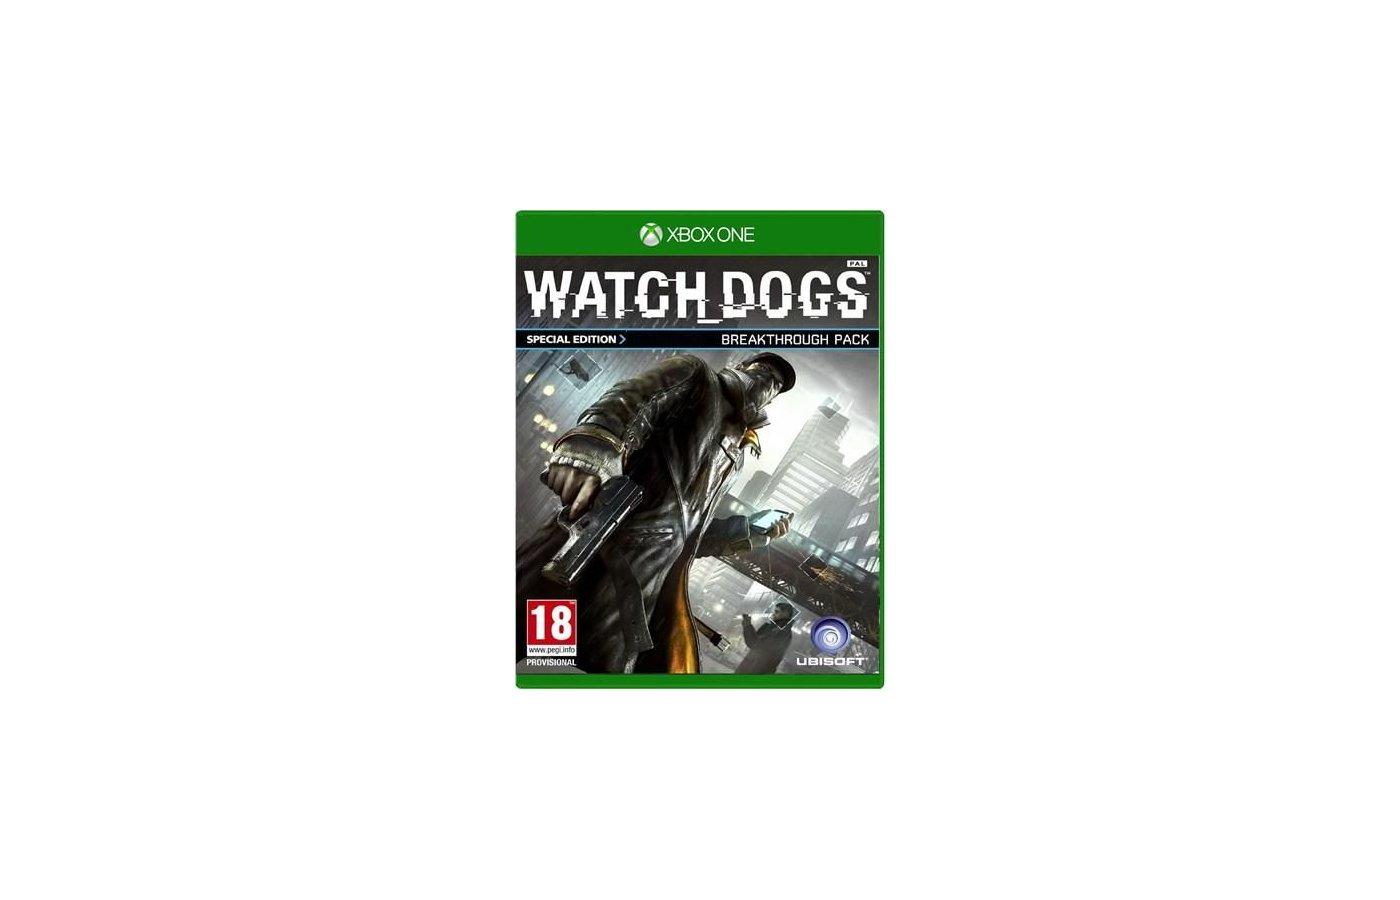 WatchDogs Xbox One английская версия